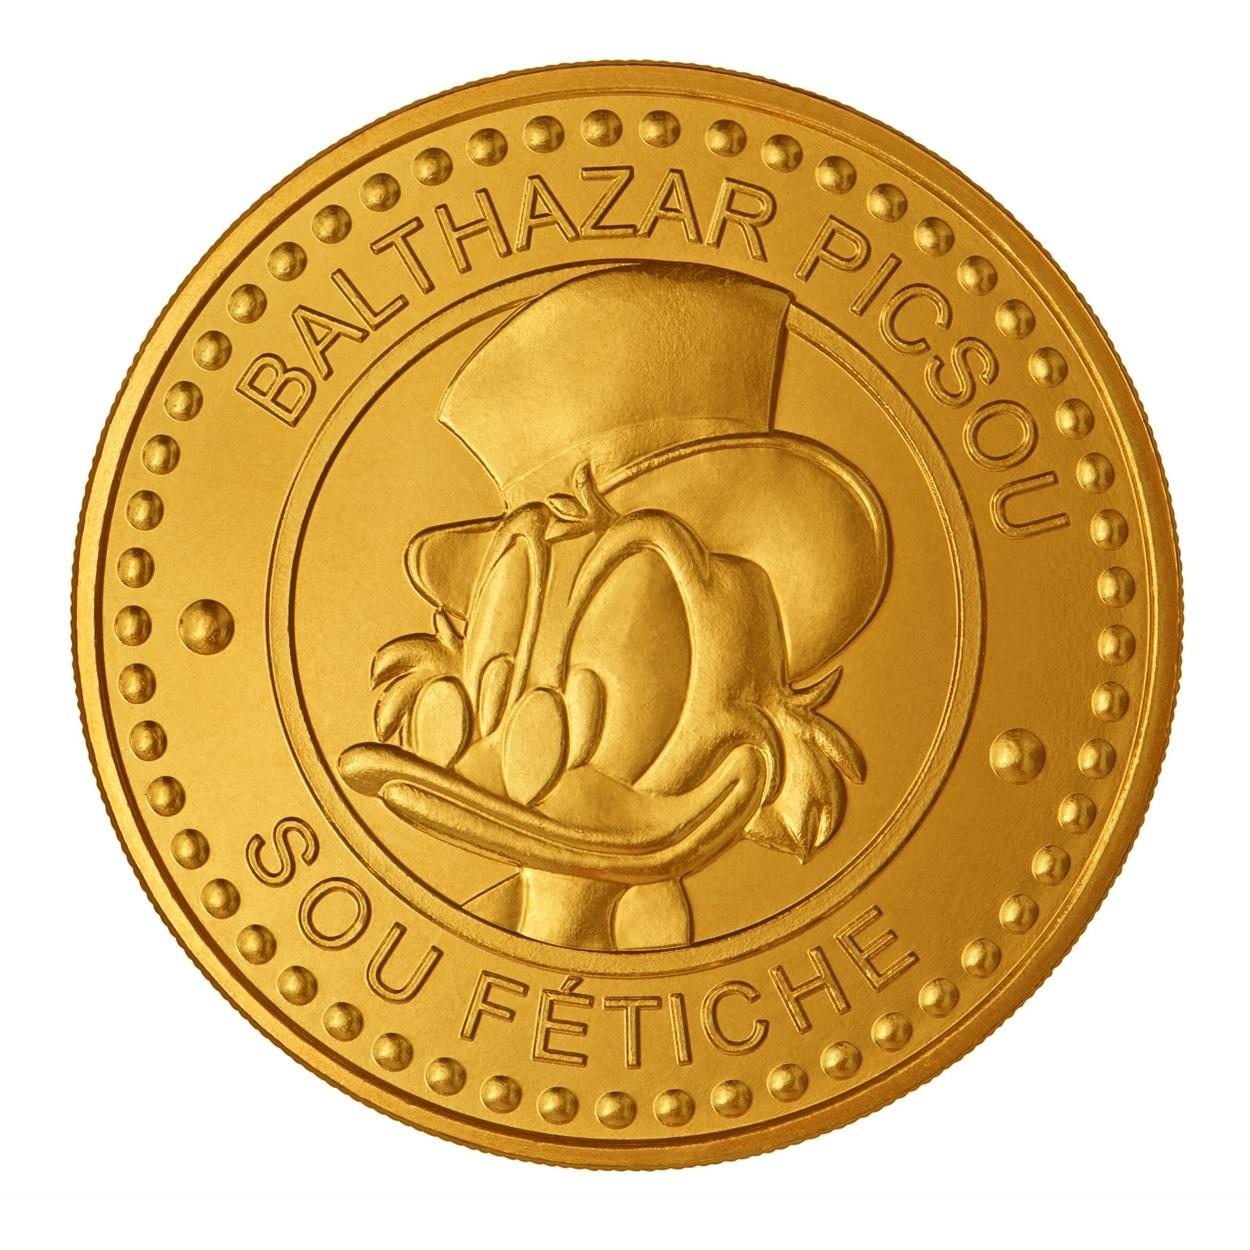 (FMED.Méd.souv.n.d._2017_.10011311620000) Memory token - Scrooge McDuck's Number one Dime Obverse (zoom)